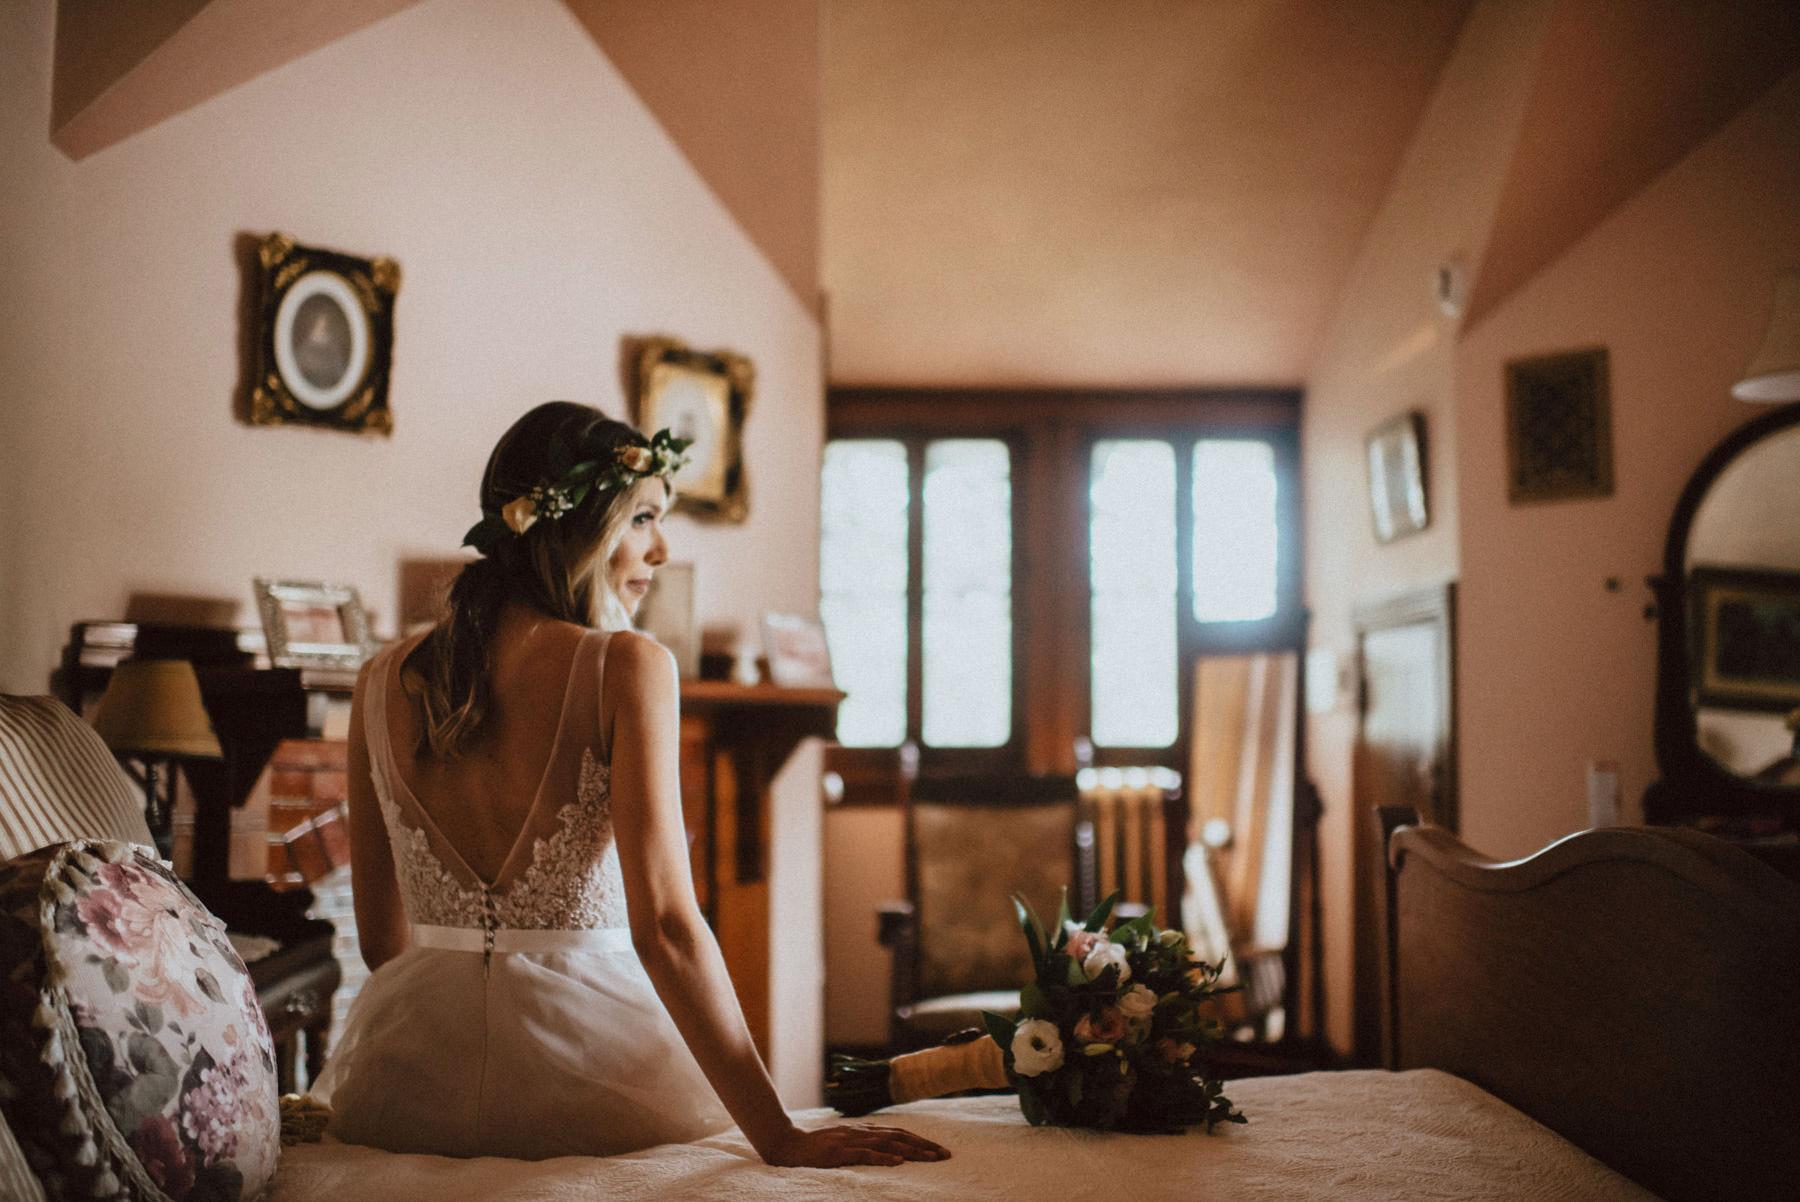 083-knowlton-mansion-wedding-6.jpg